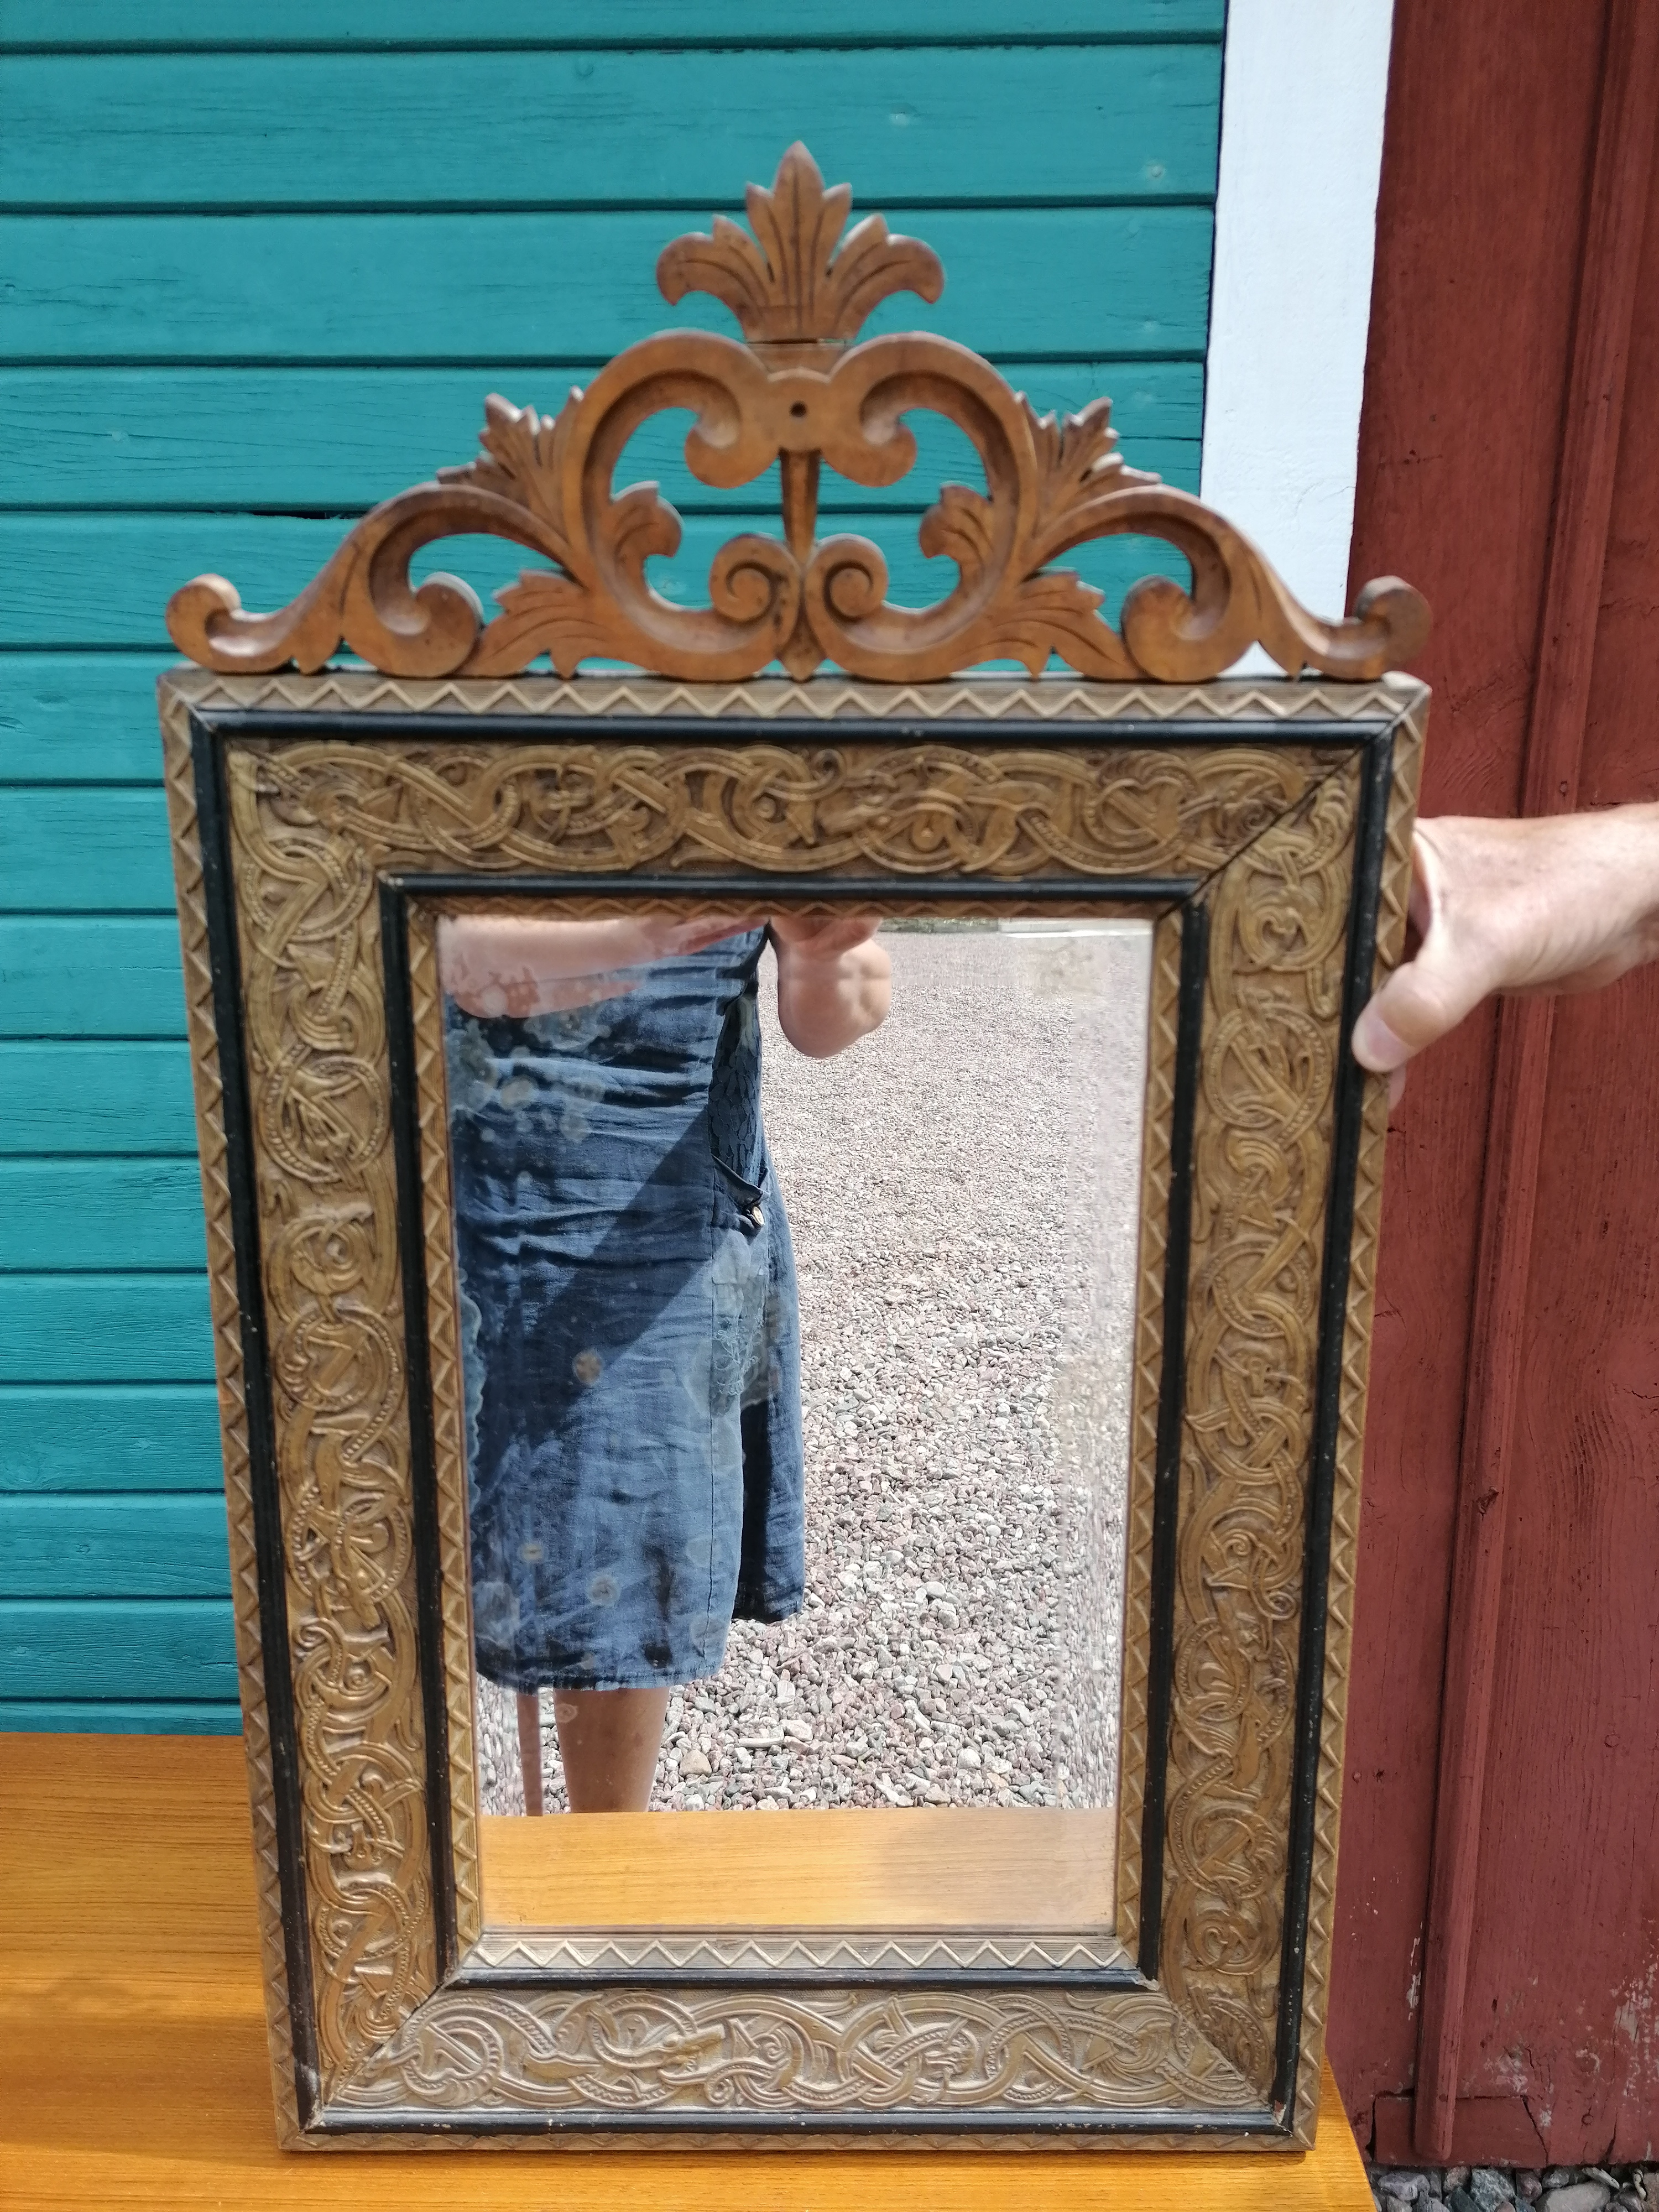 Spegel från tidigt 1800-tal